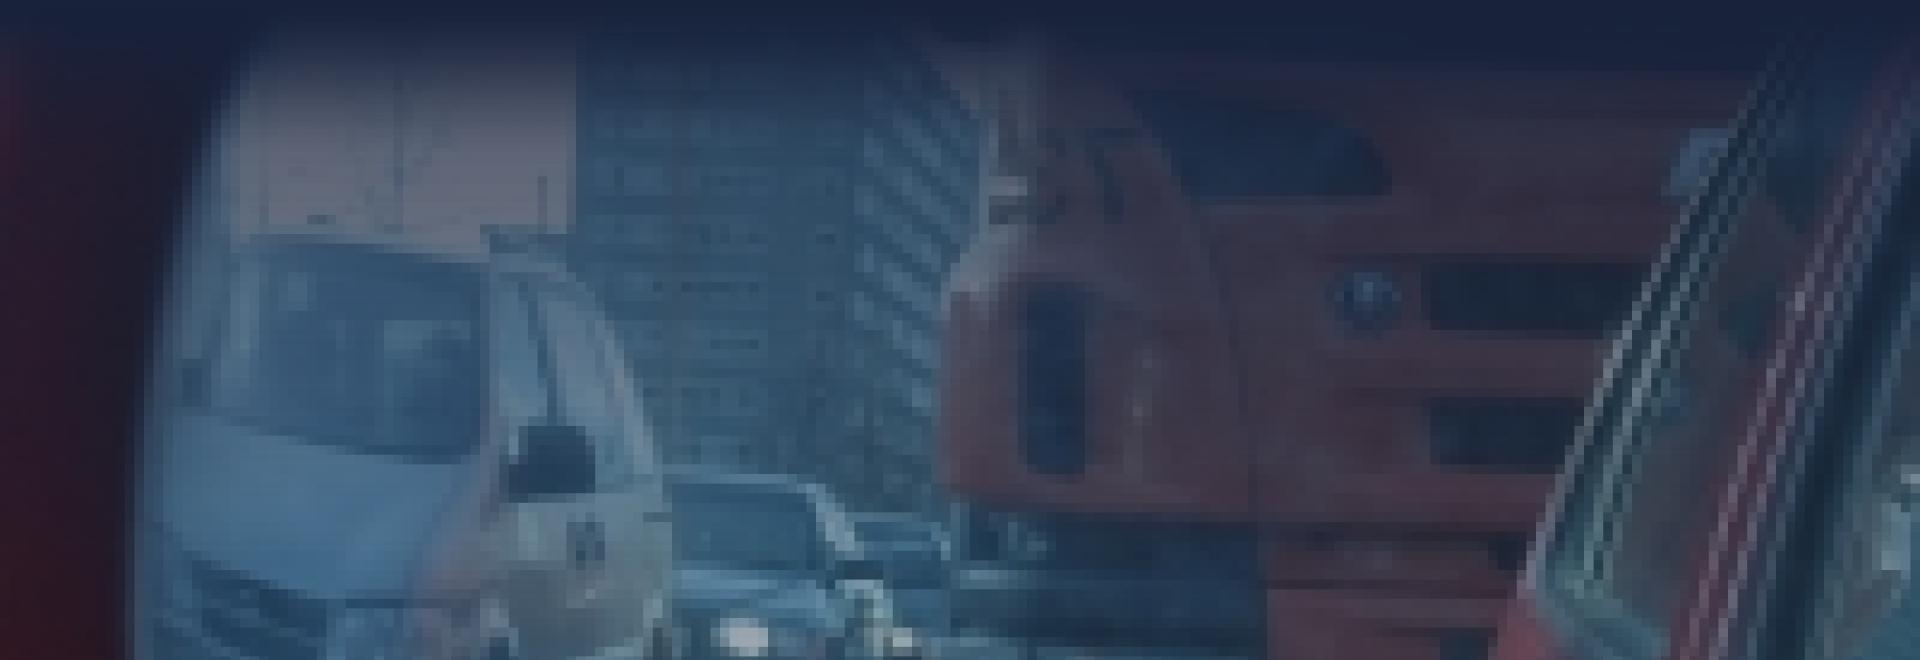 Verkeersongeval | Compensa Letselschade